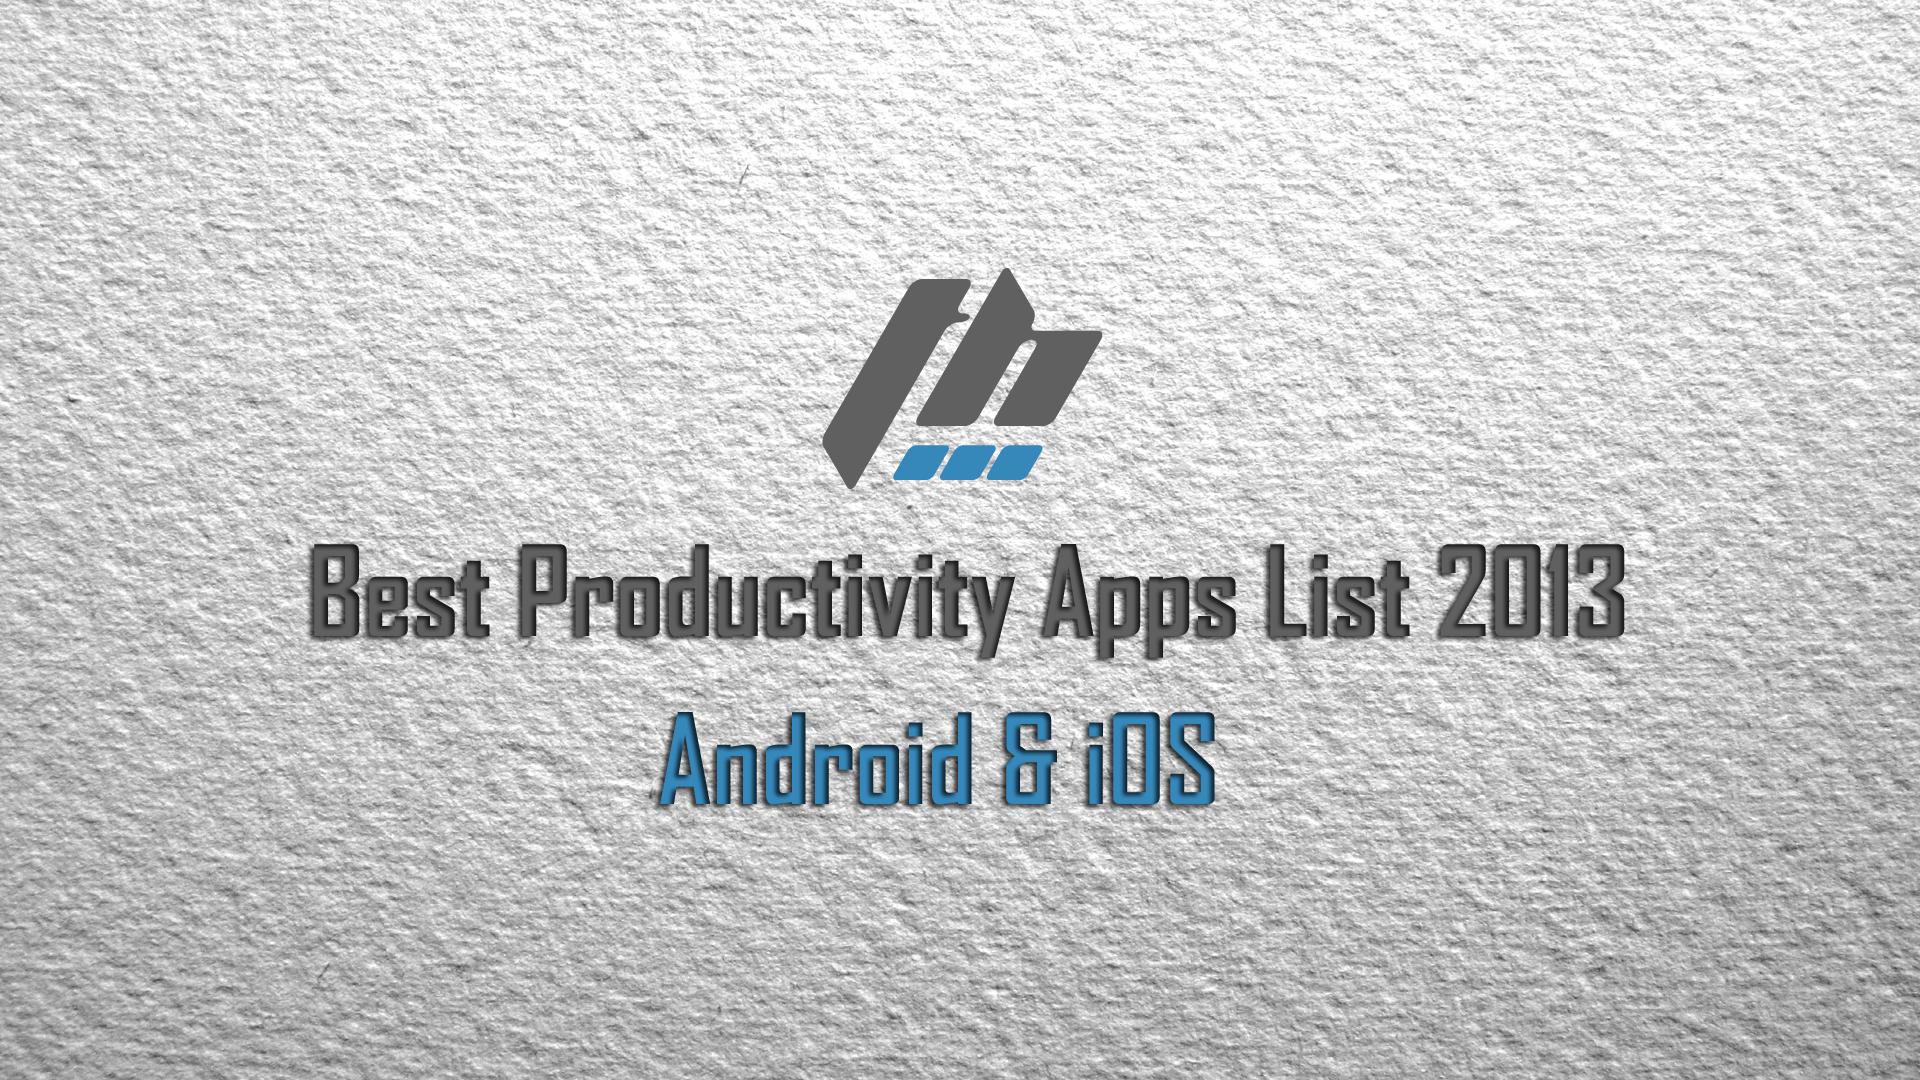 Best Productivity Apps List 2013